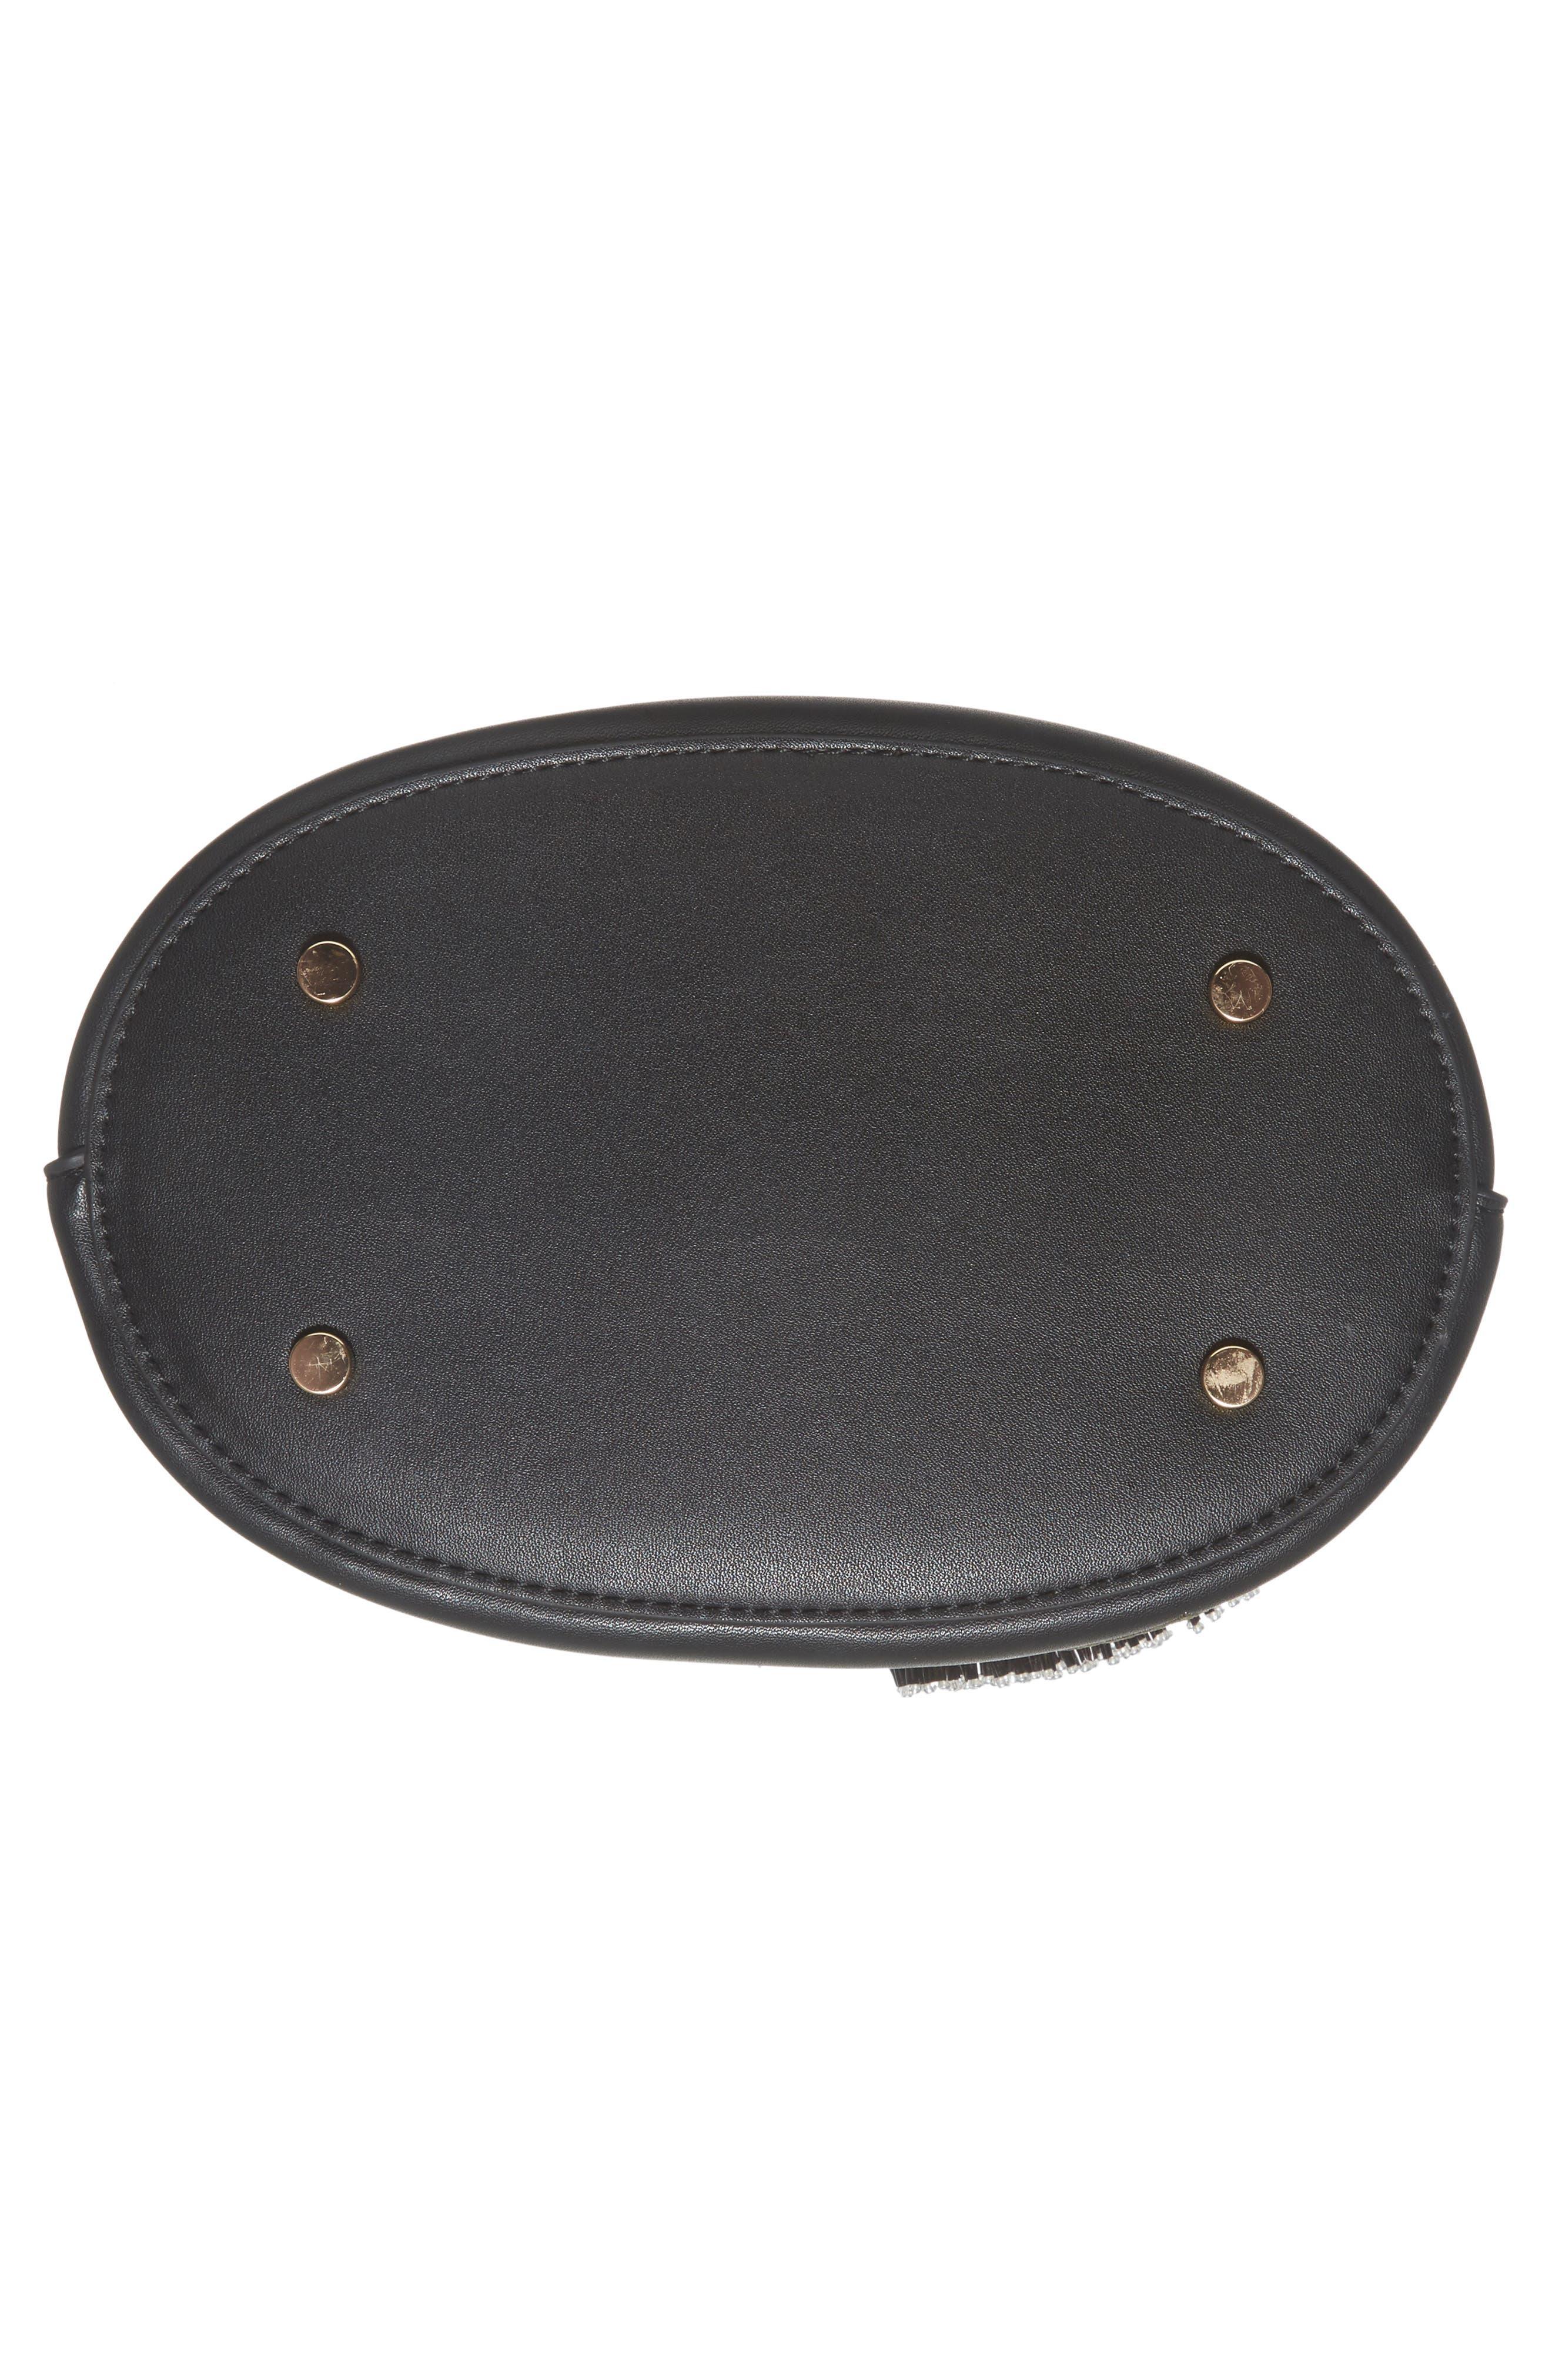 Sadie Floral Faux Leather Bucket Bag,                             Alternate thumbnail 6, color,                             Black Multi